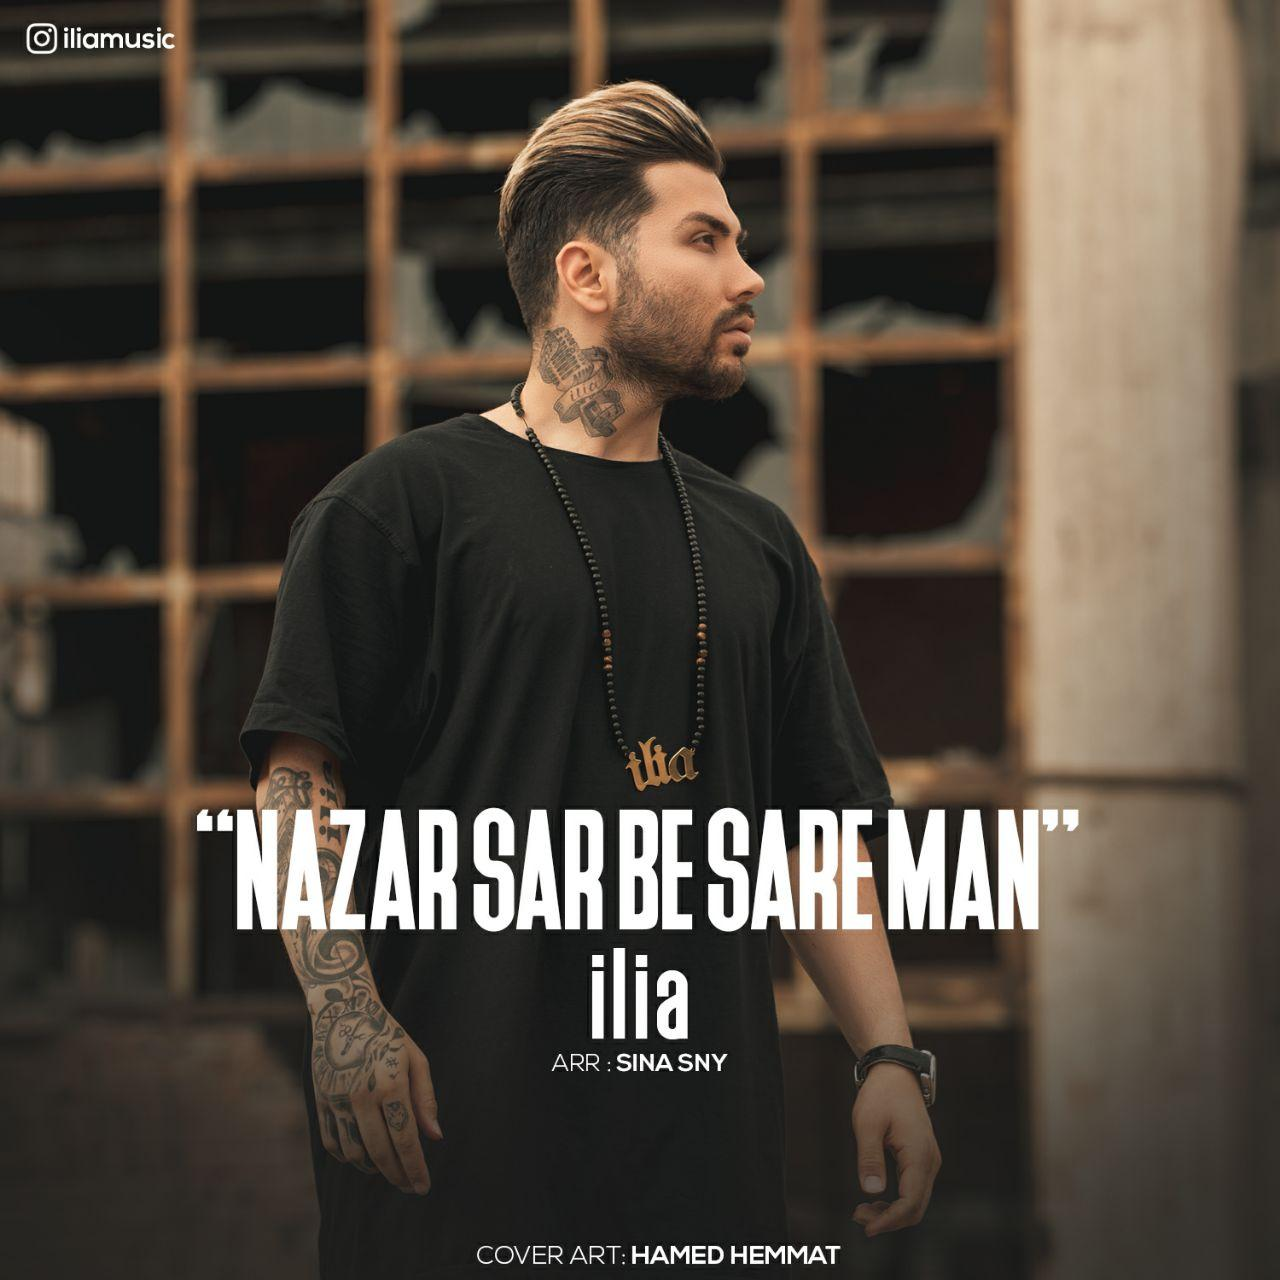 ilia – Nazar Sar Be Sare Man